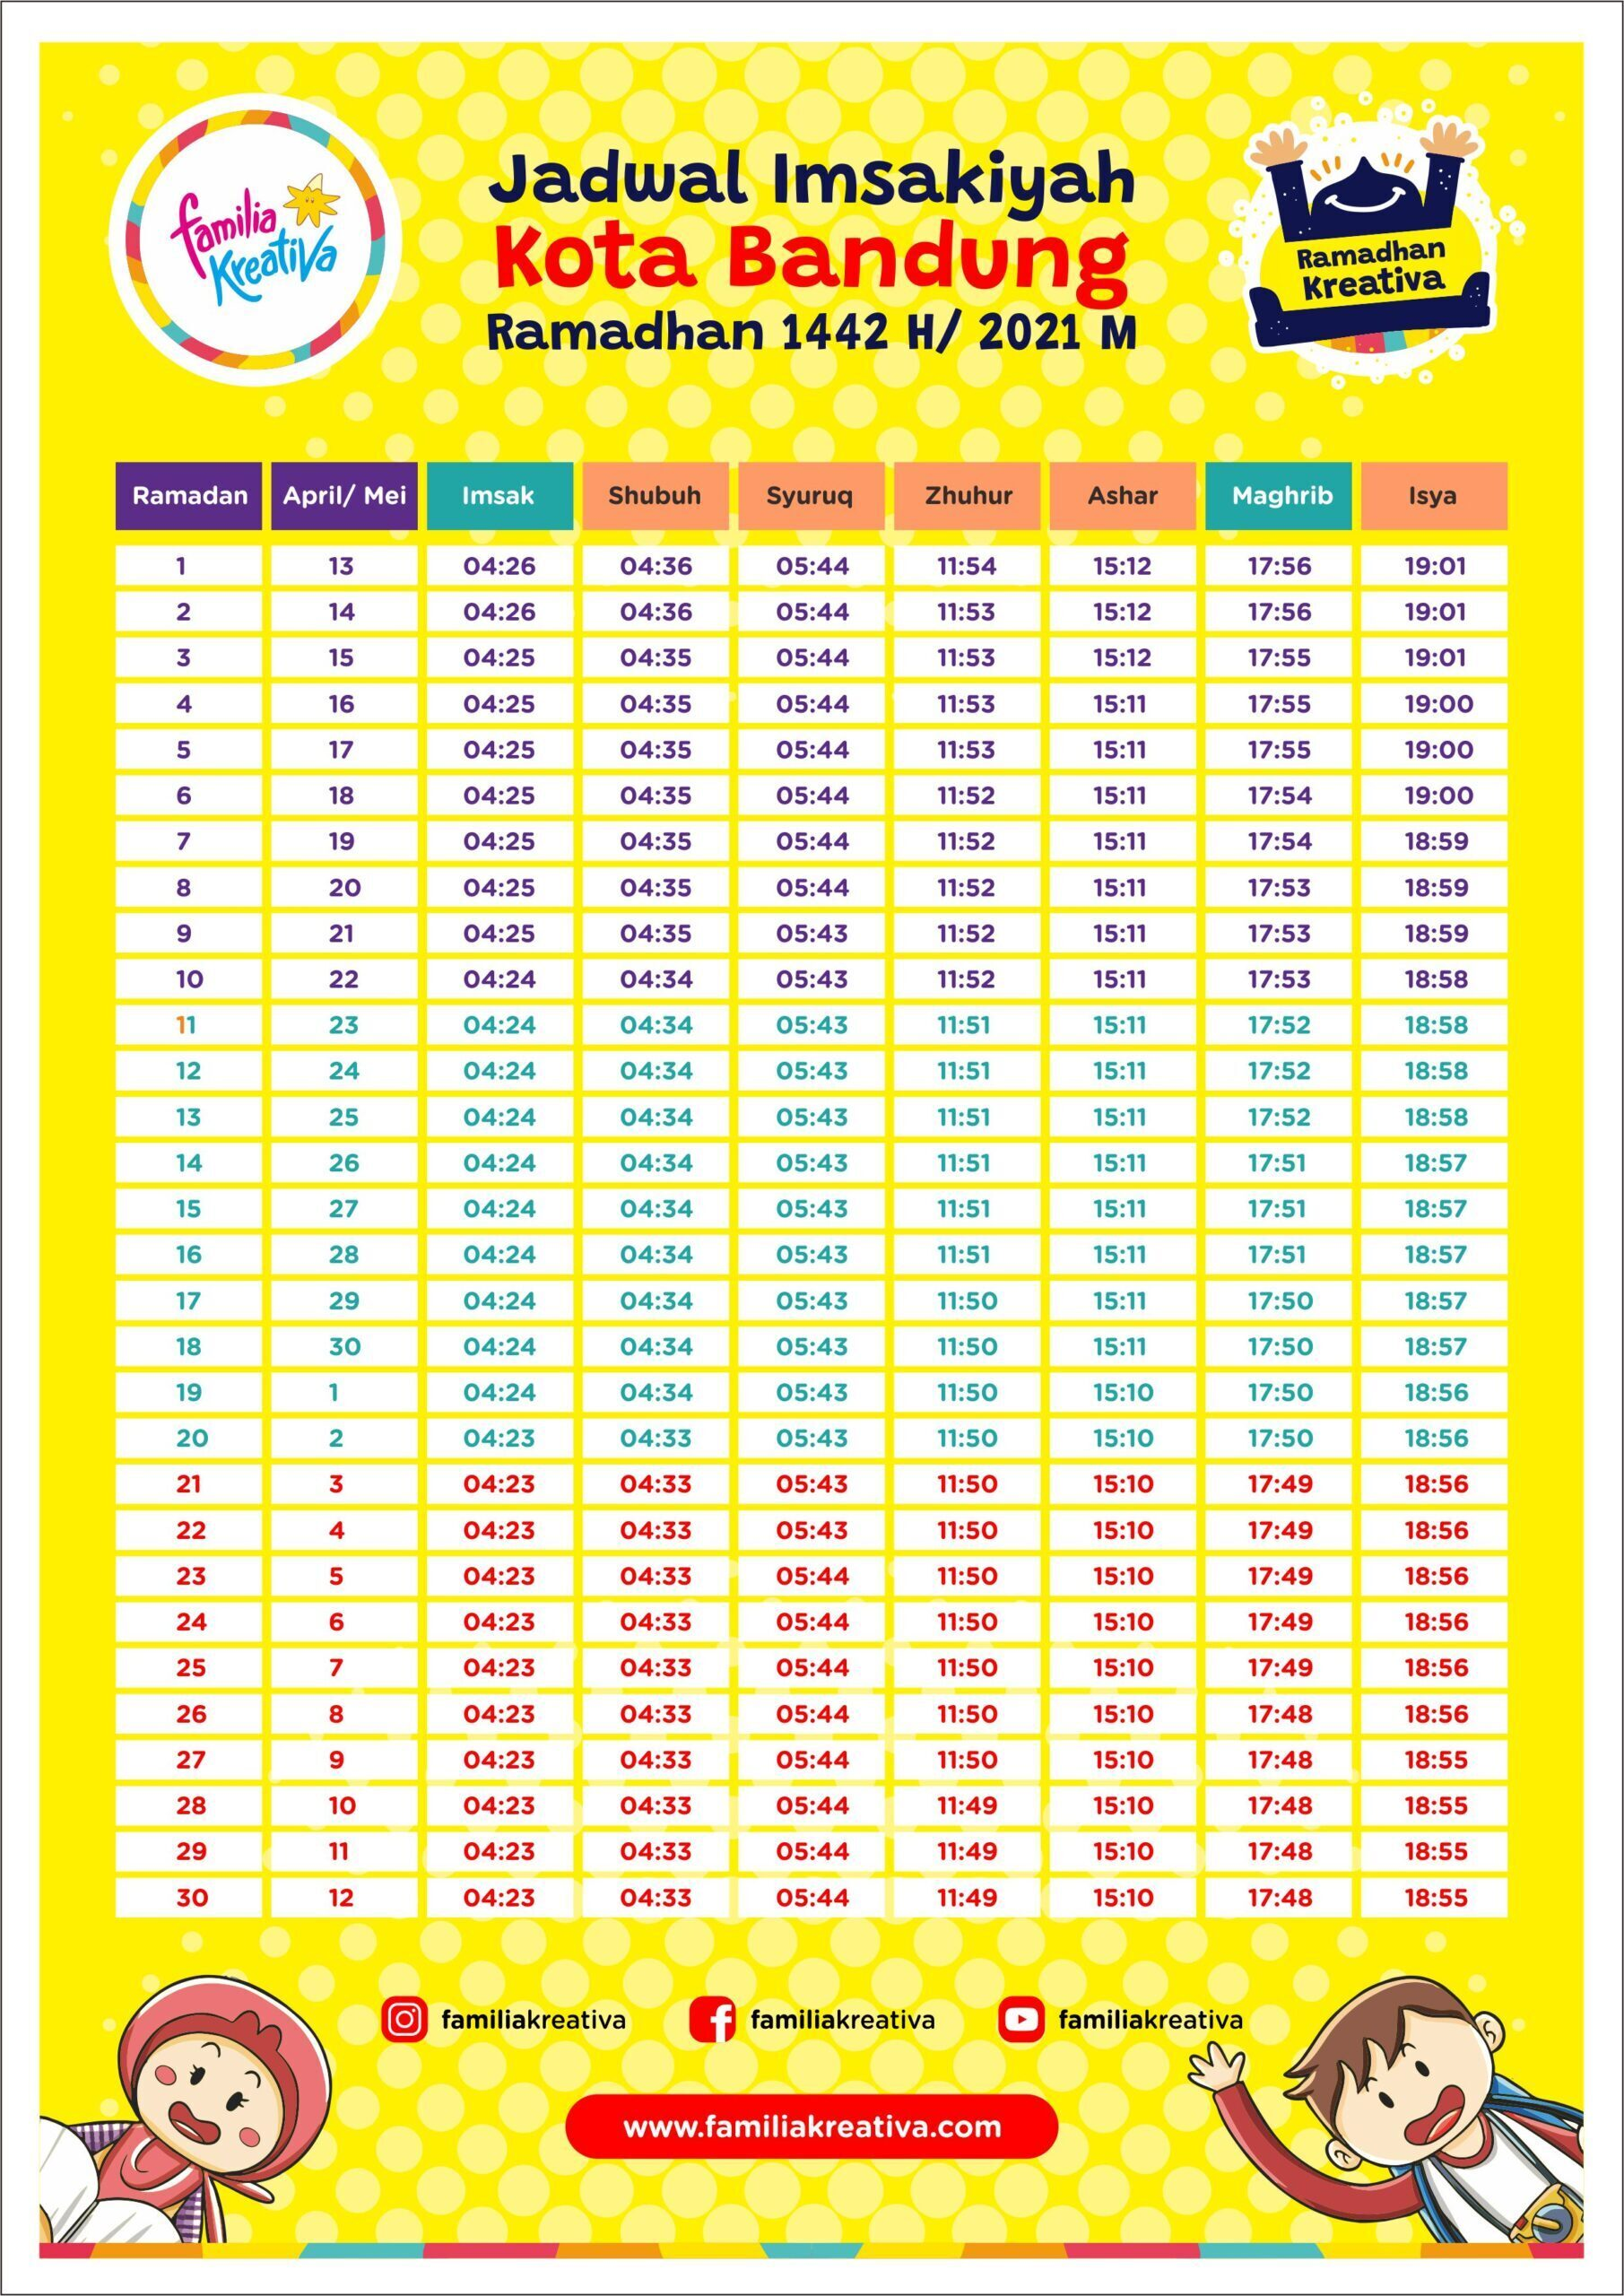 Jadwal Imsakiyah Bandung 1 Ramadhan, 13 April 2021